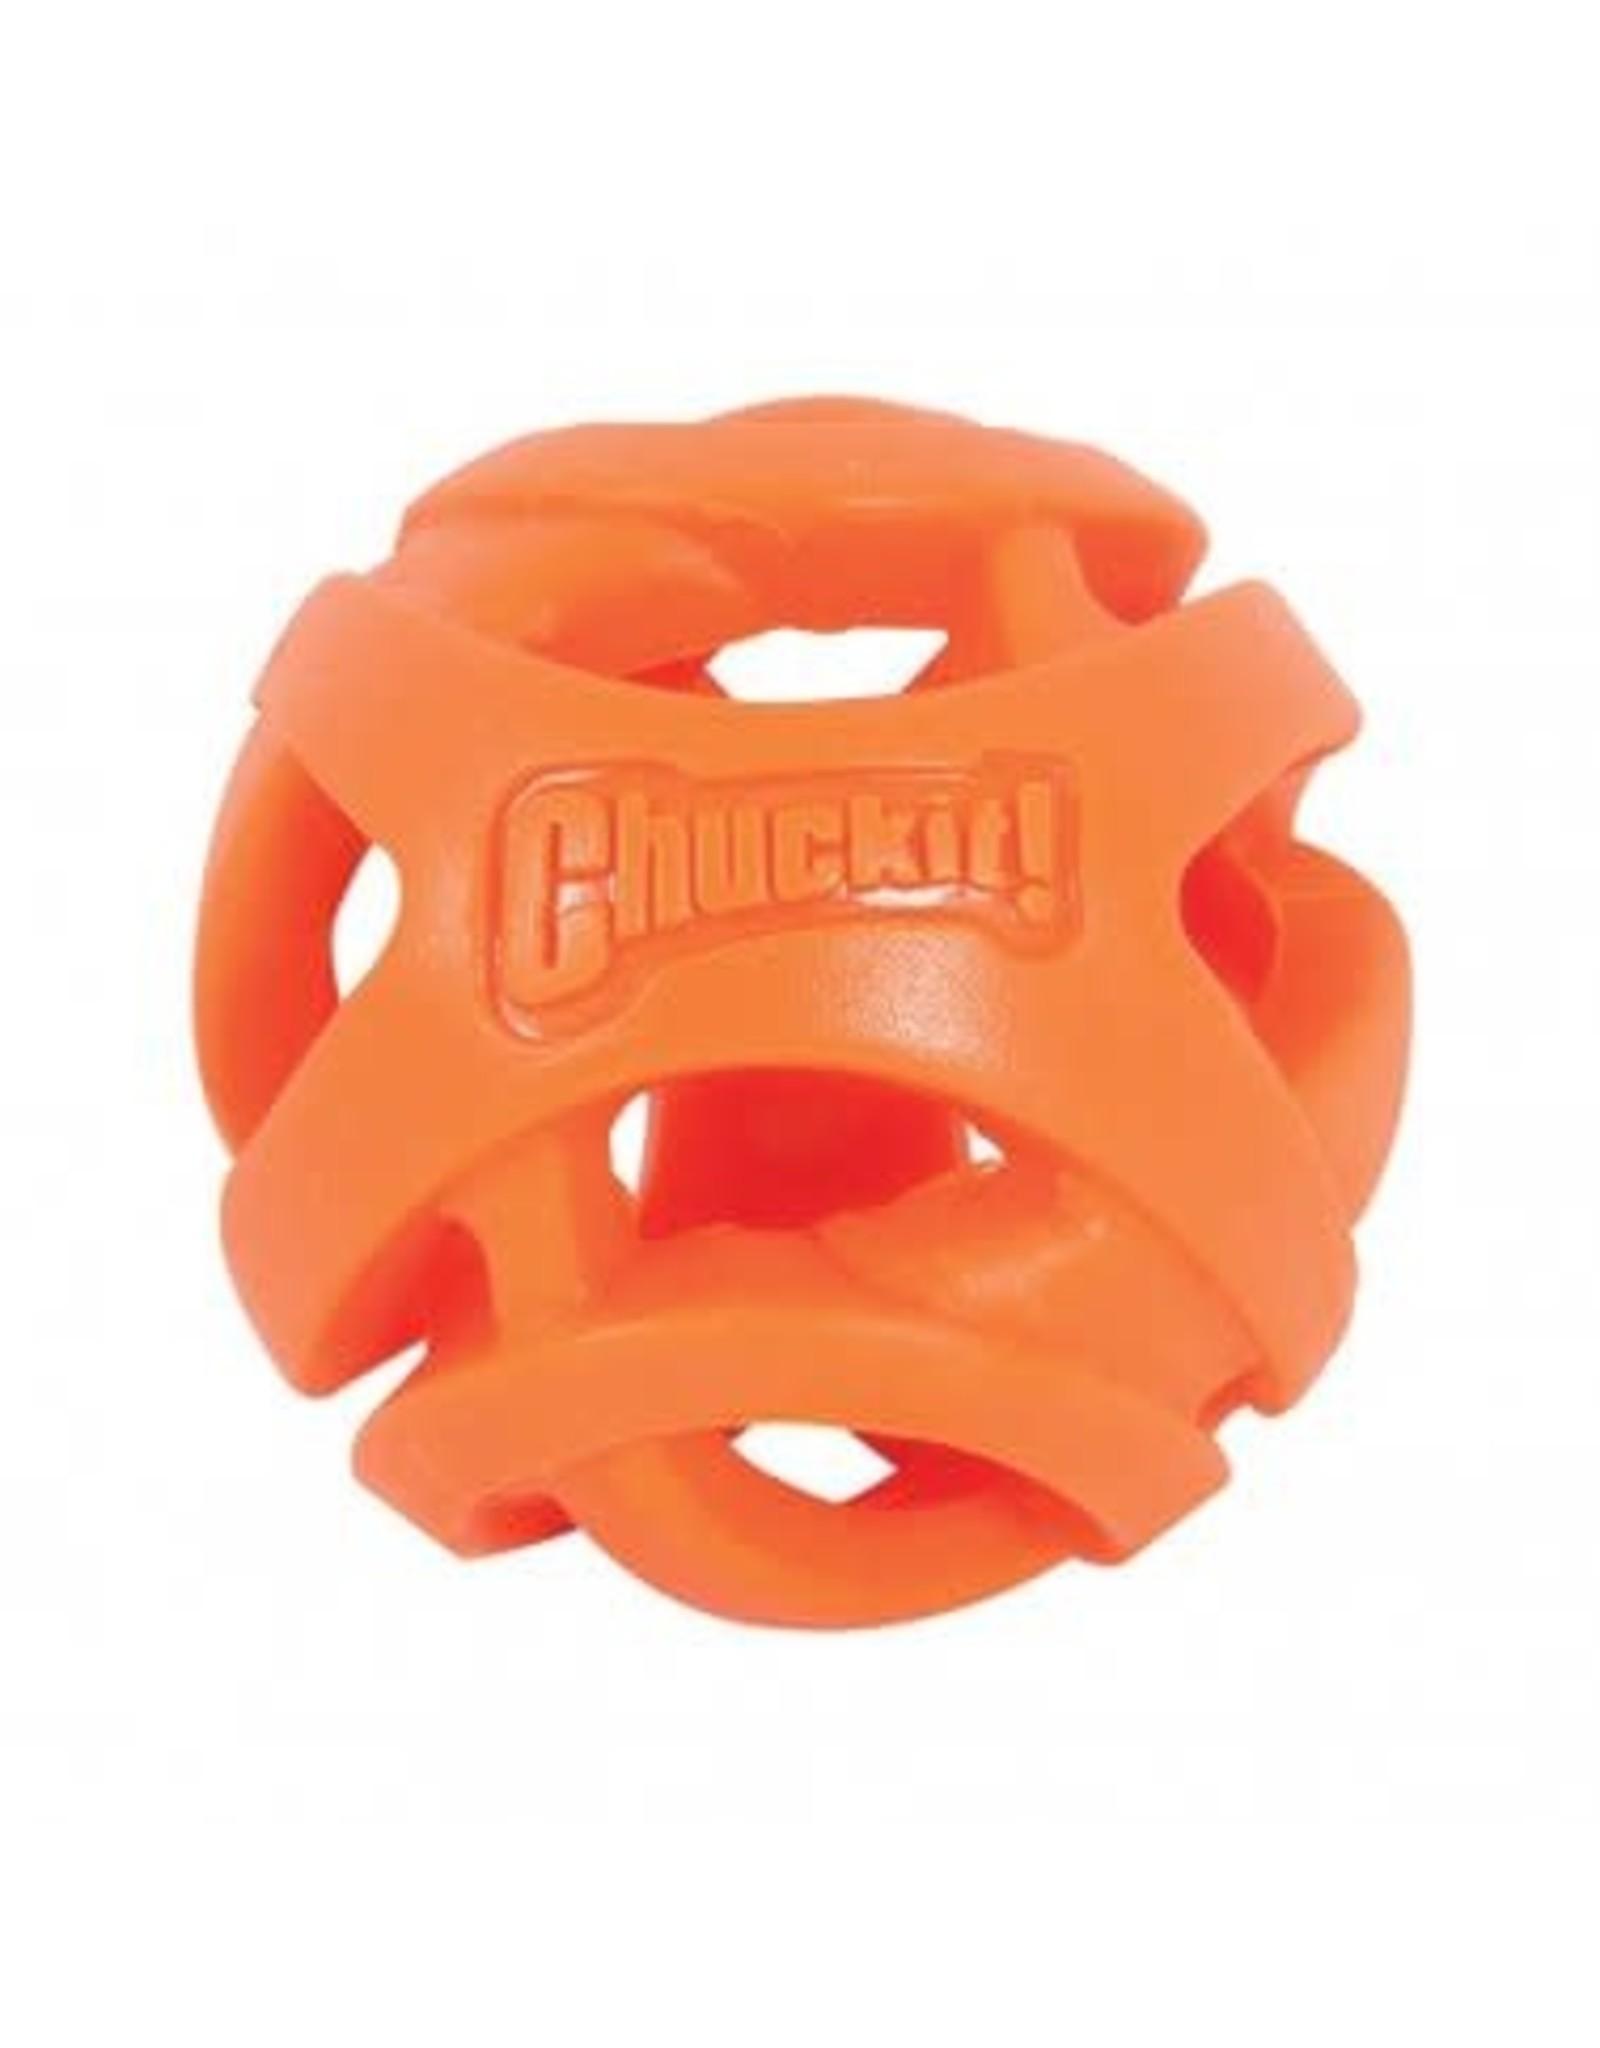 Chuckit! Chuckit! Breathe Right Fetch Ball Dog Toy